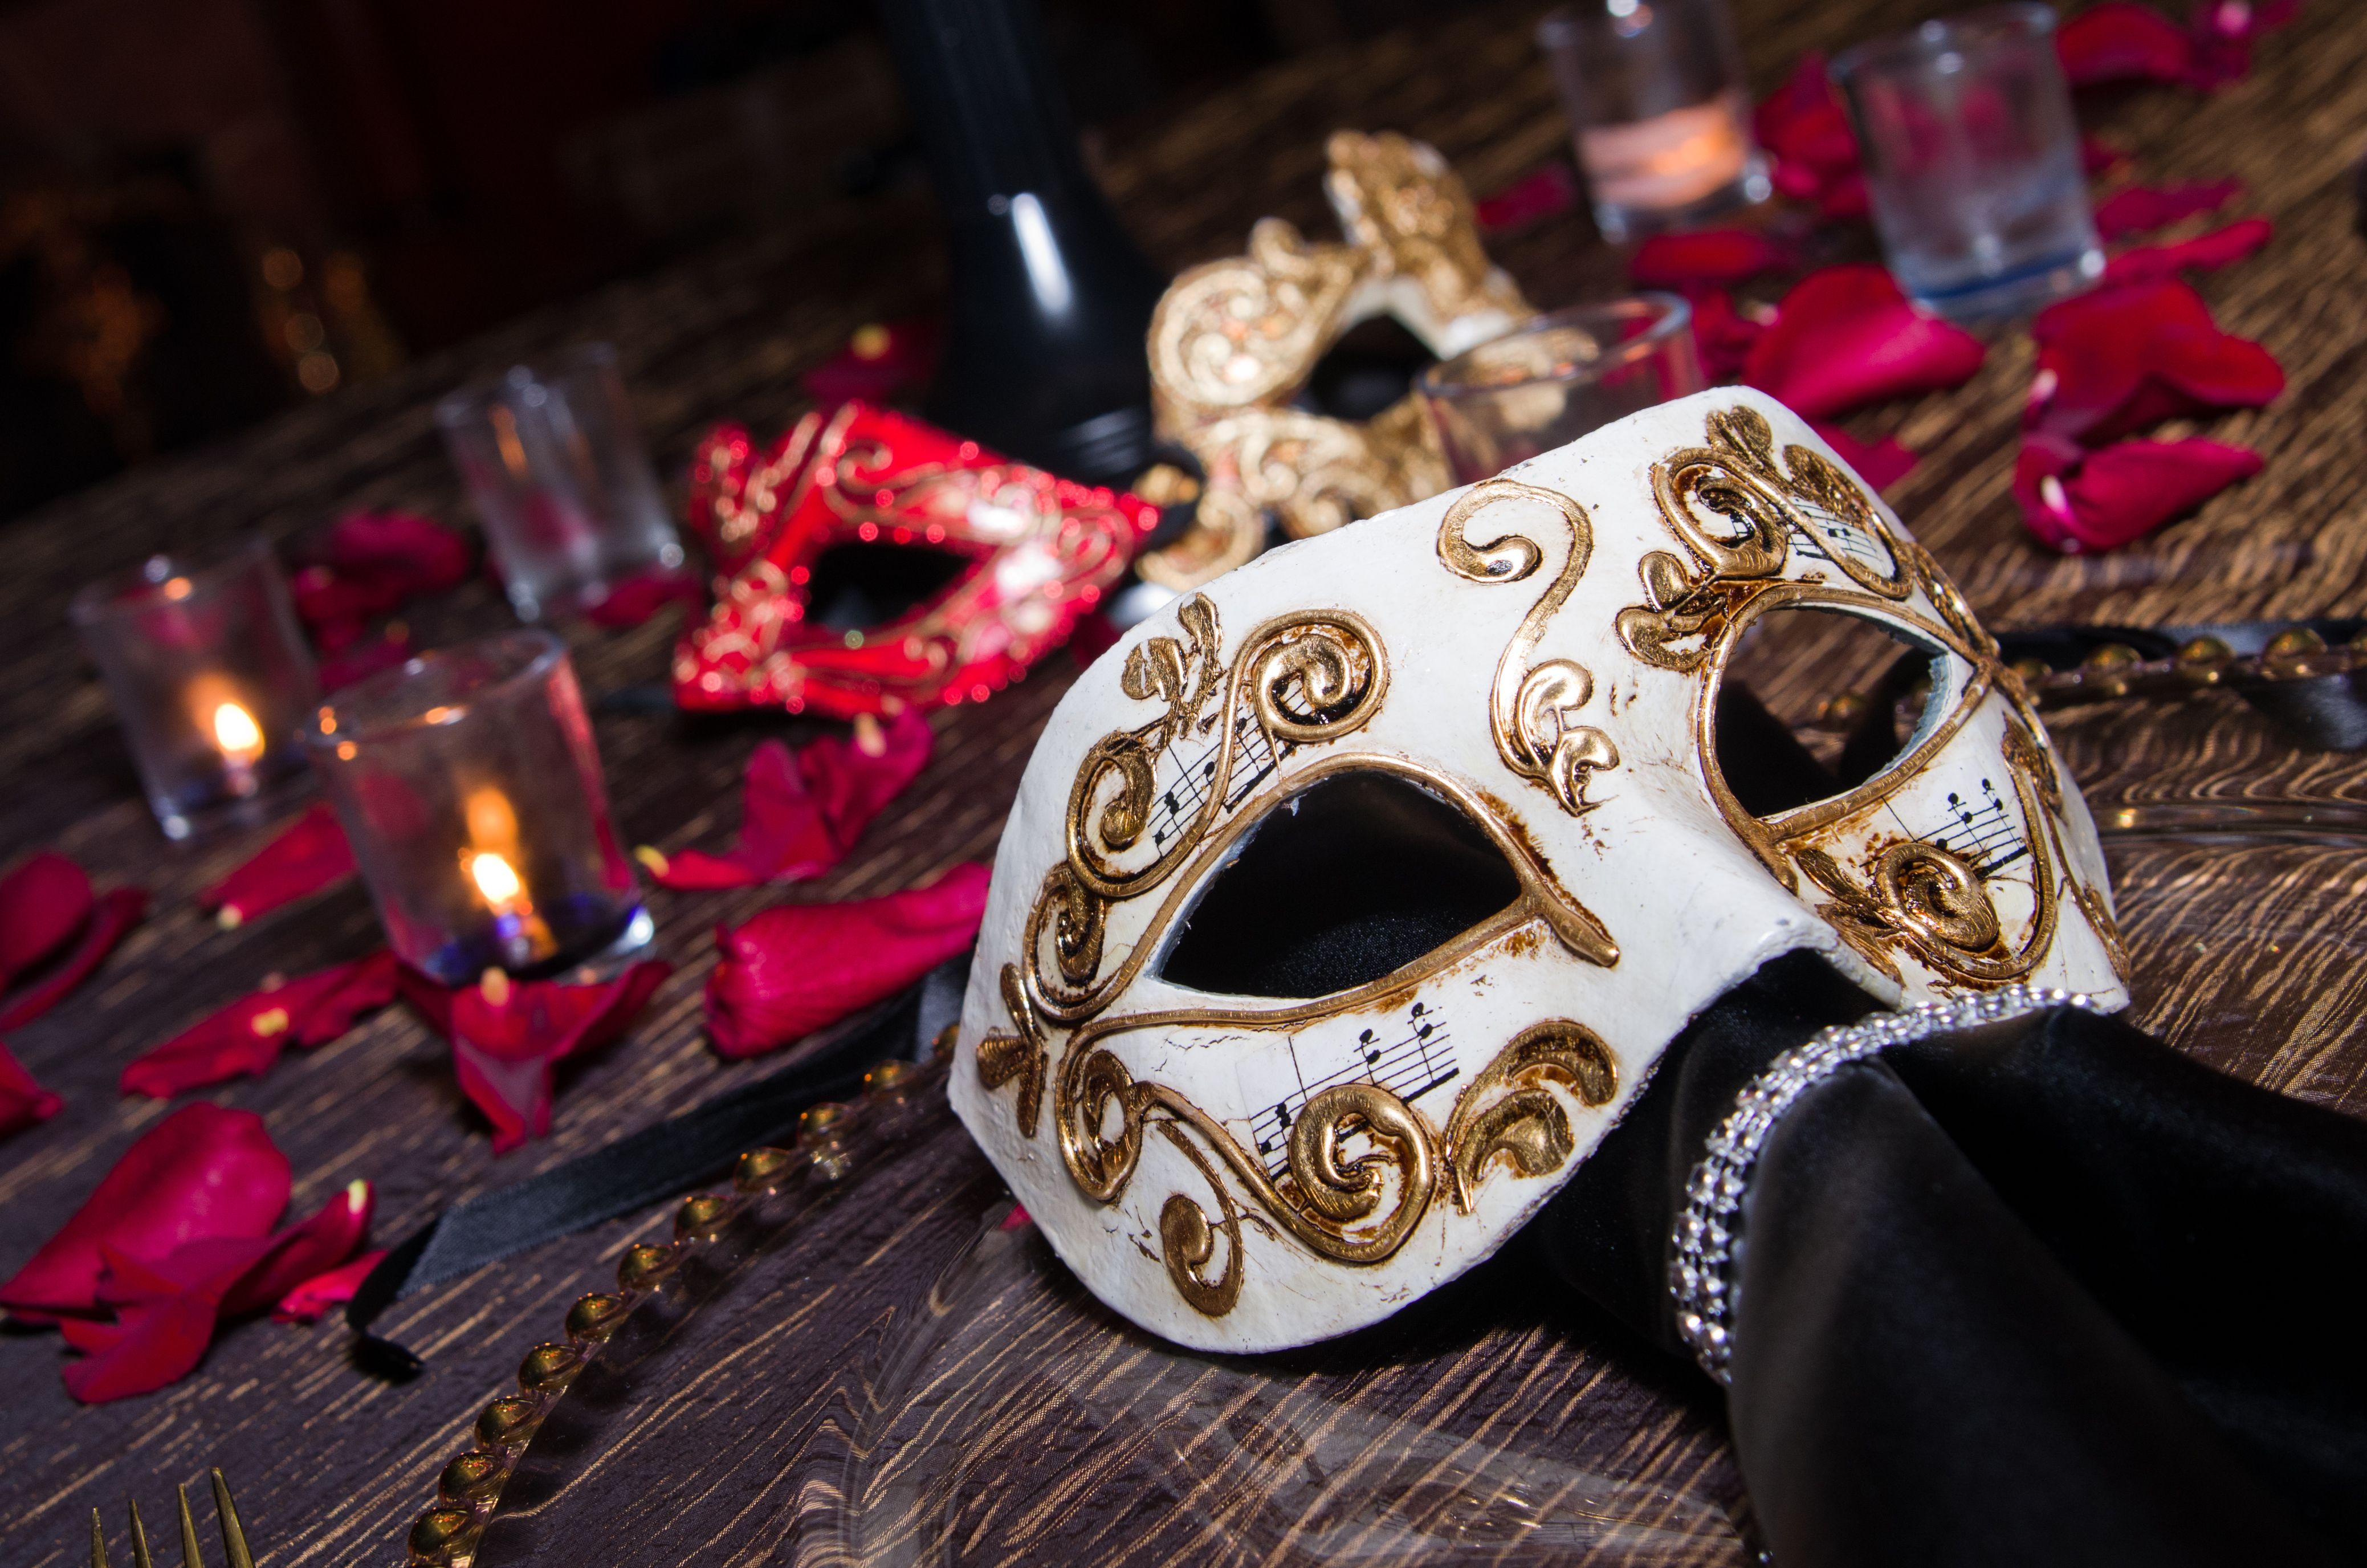 Italian themed wedding decor. Balocoloc Venetian Masks used as part ...